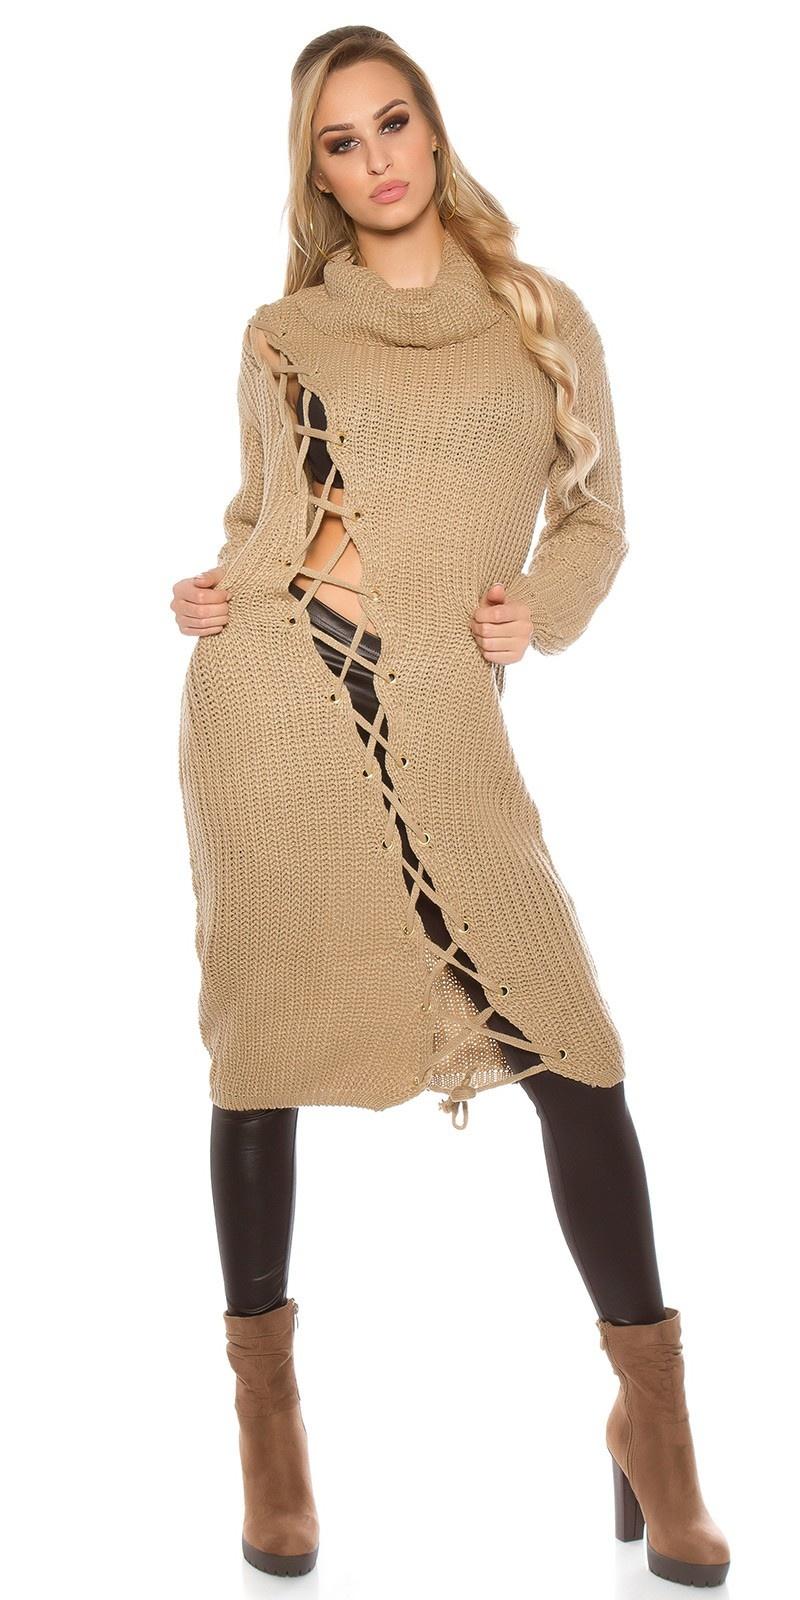 Trendy grof gebreide jurk met xl kraag cappuccino